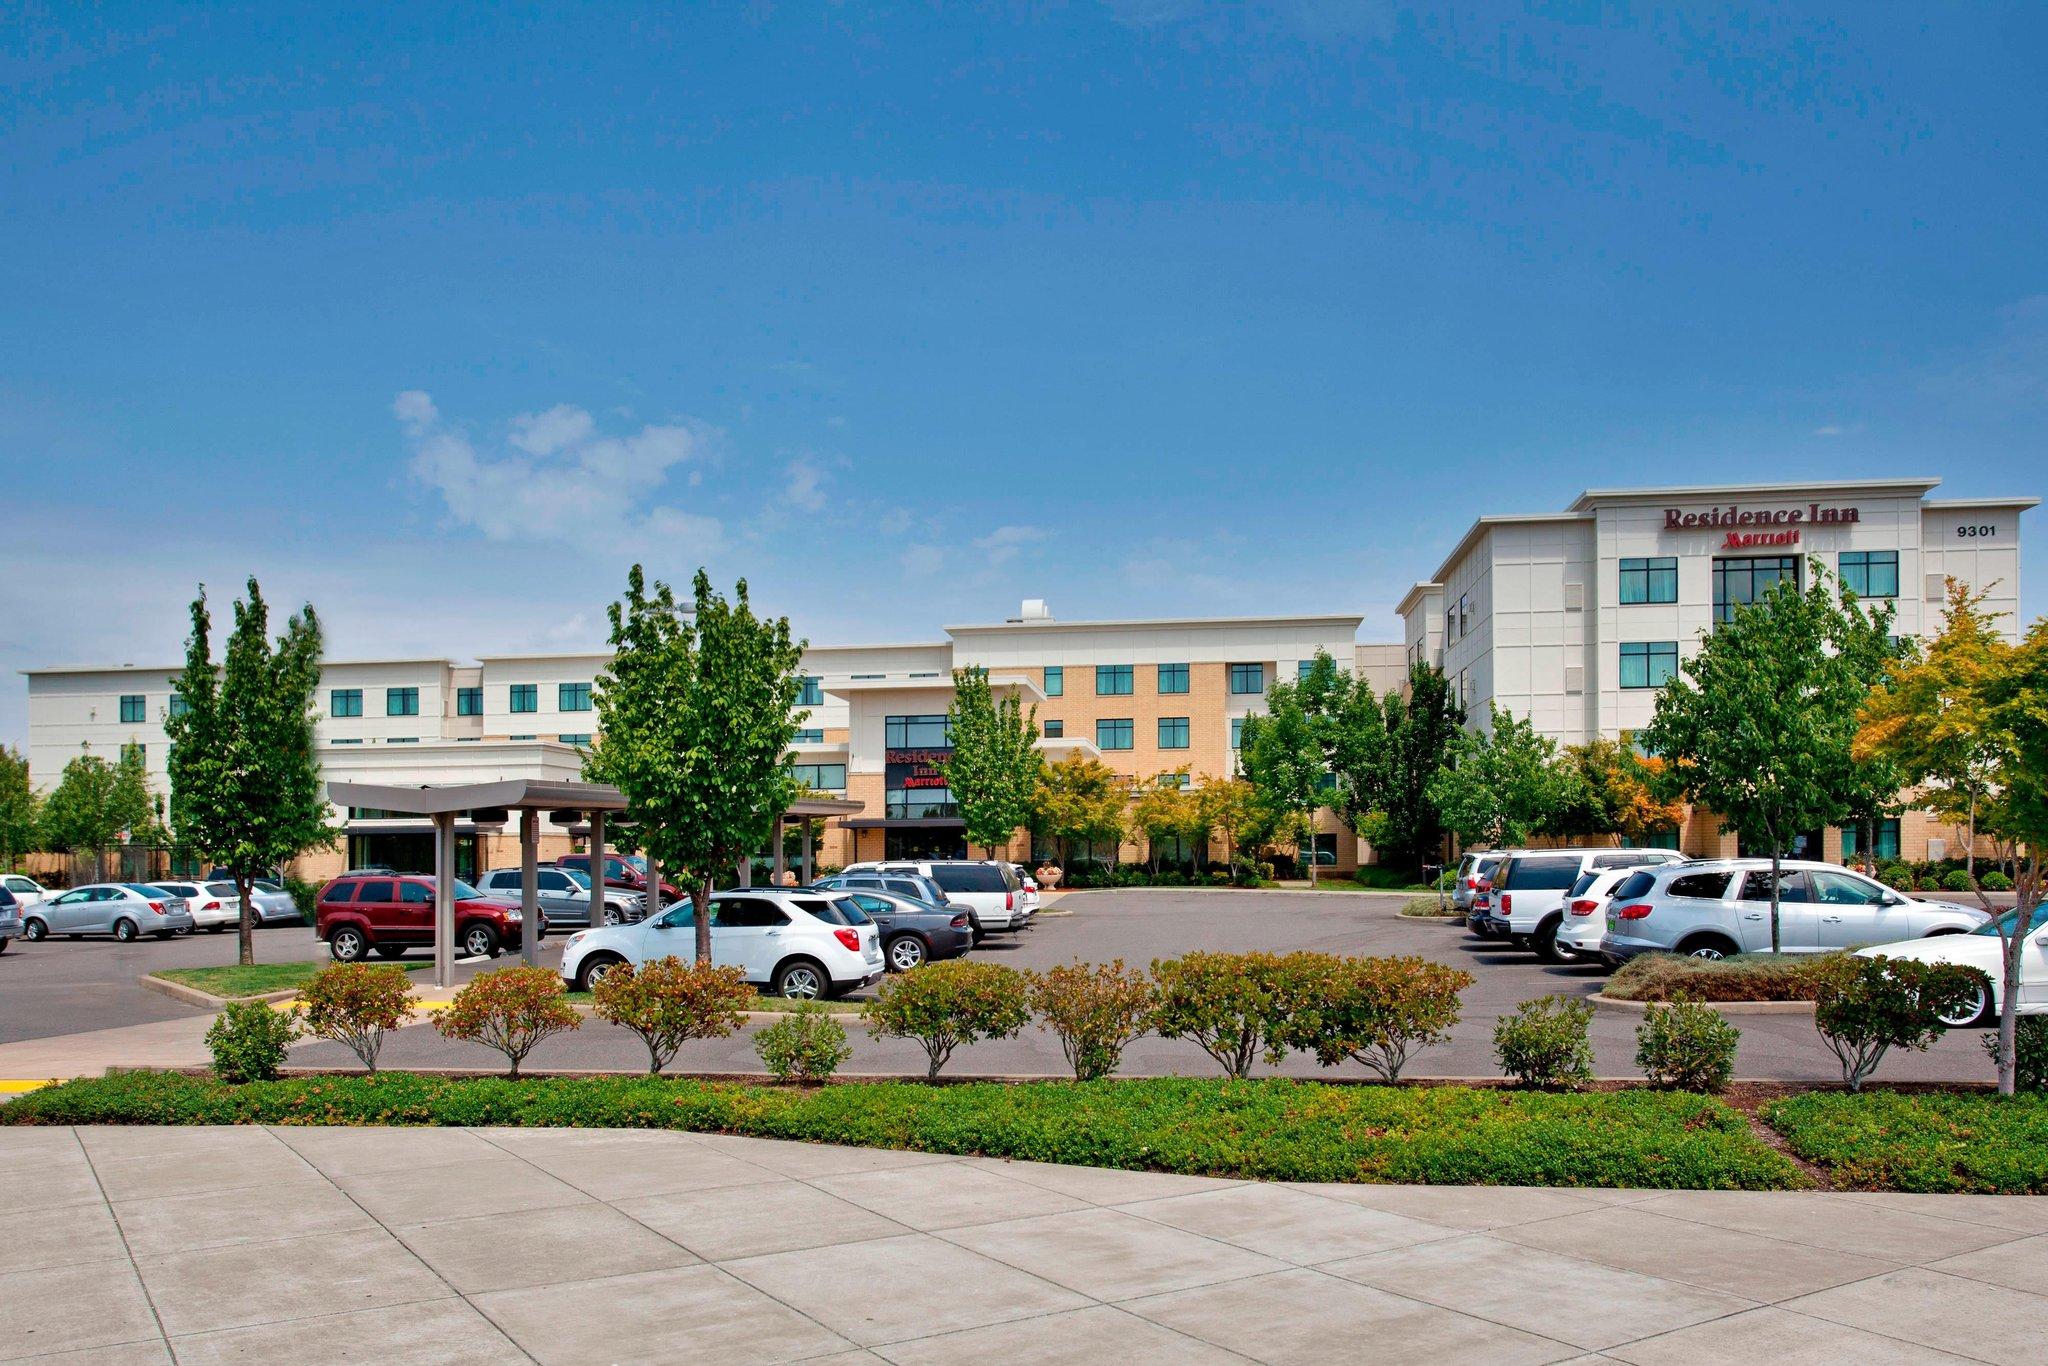 Residence Inn by Marriott Portland Airport at Cascade Station